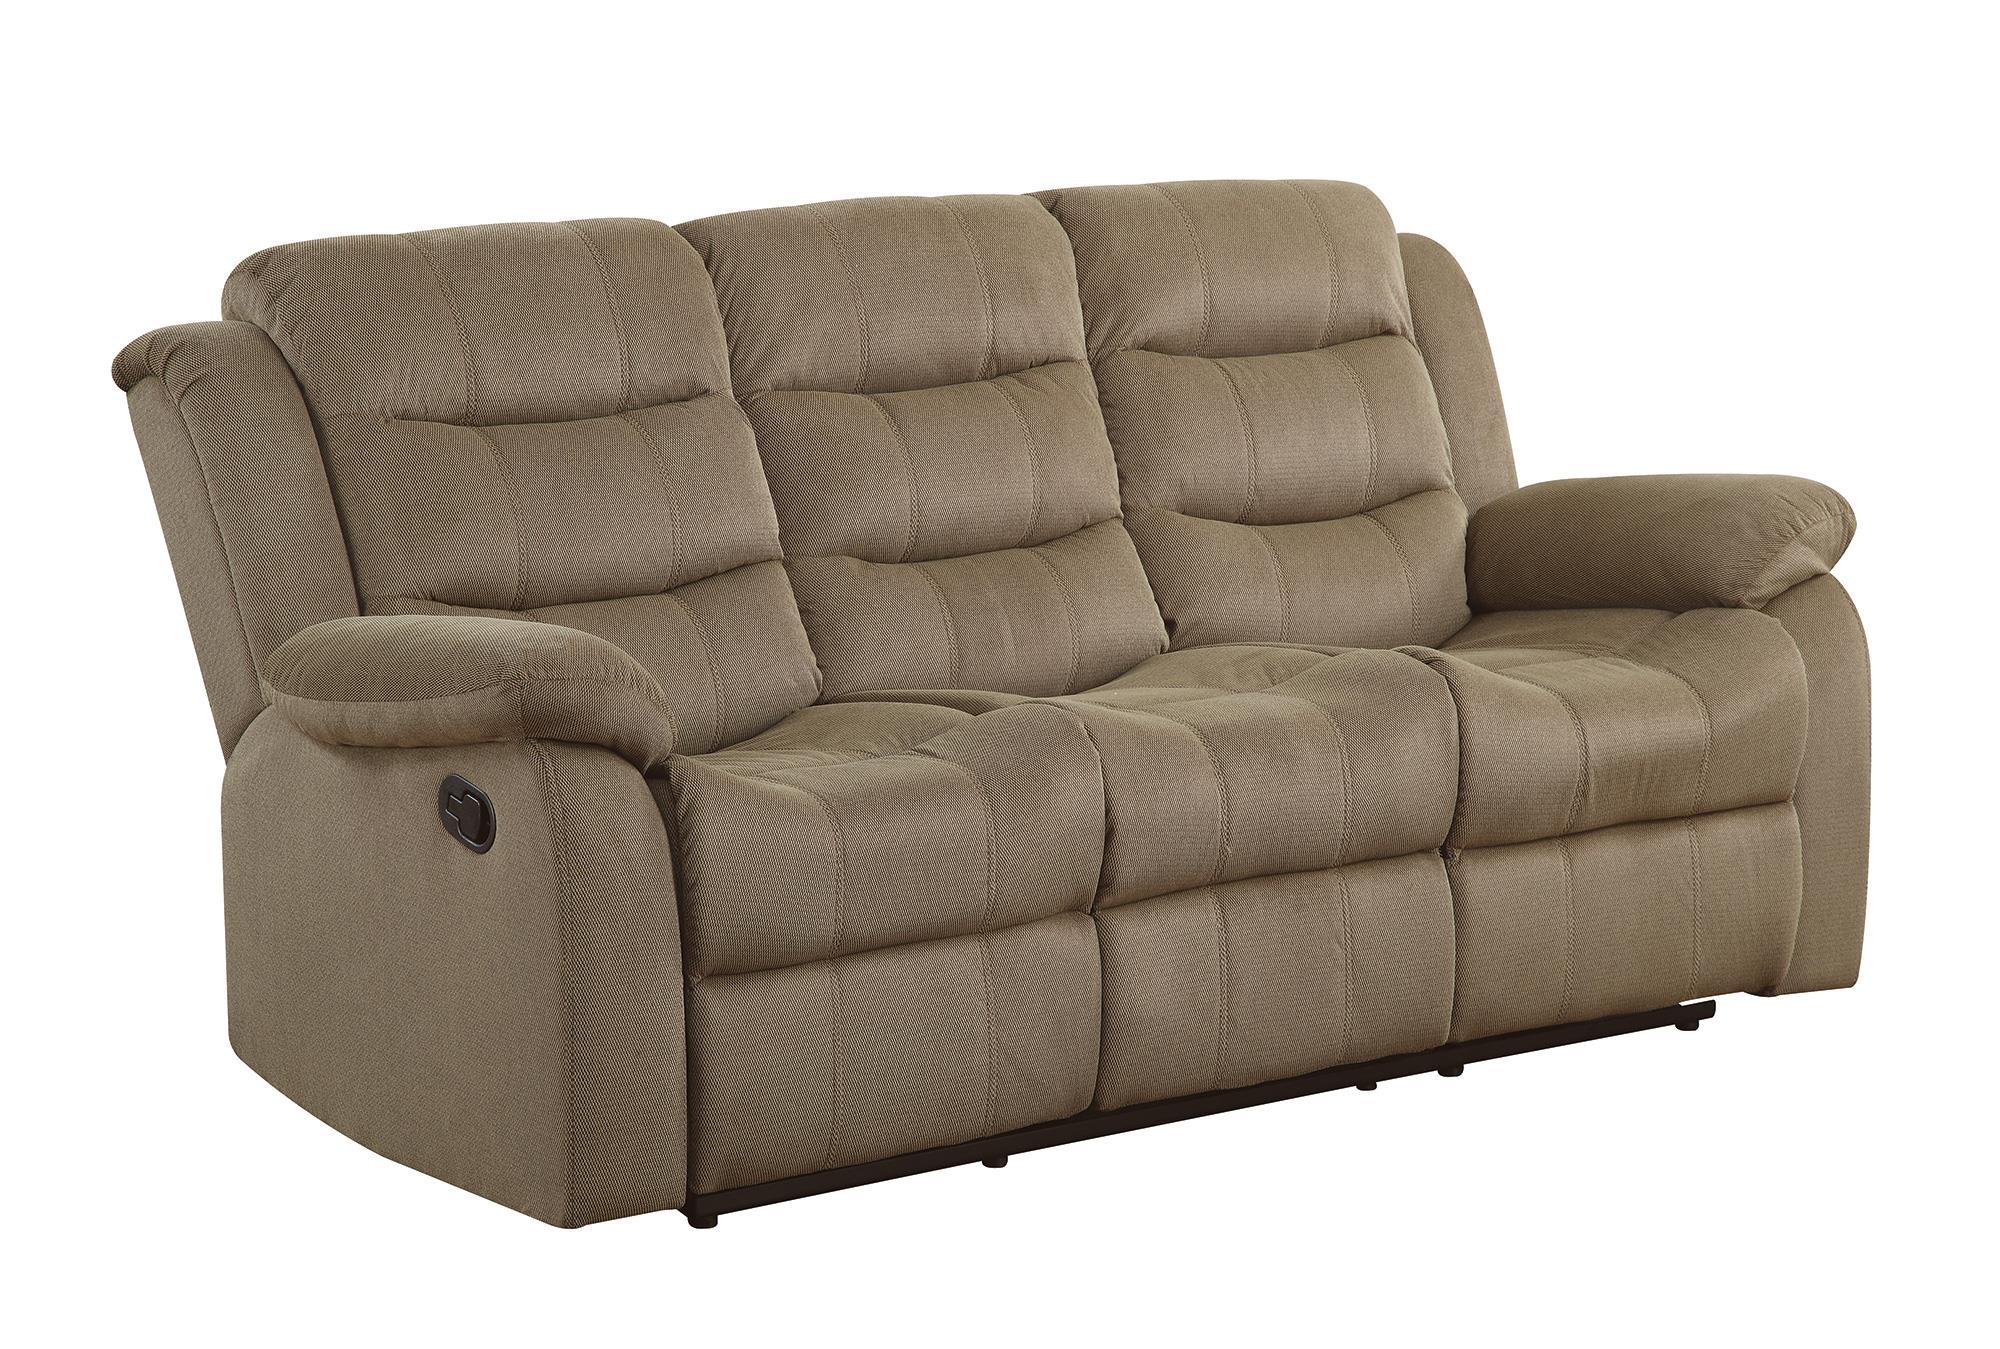 Coaster Rodman Motion Sofa - Item Number: 601884